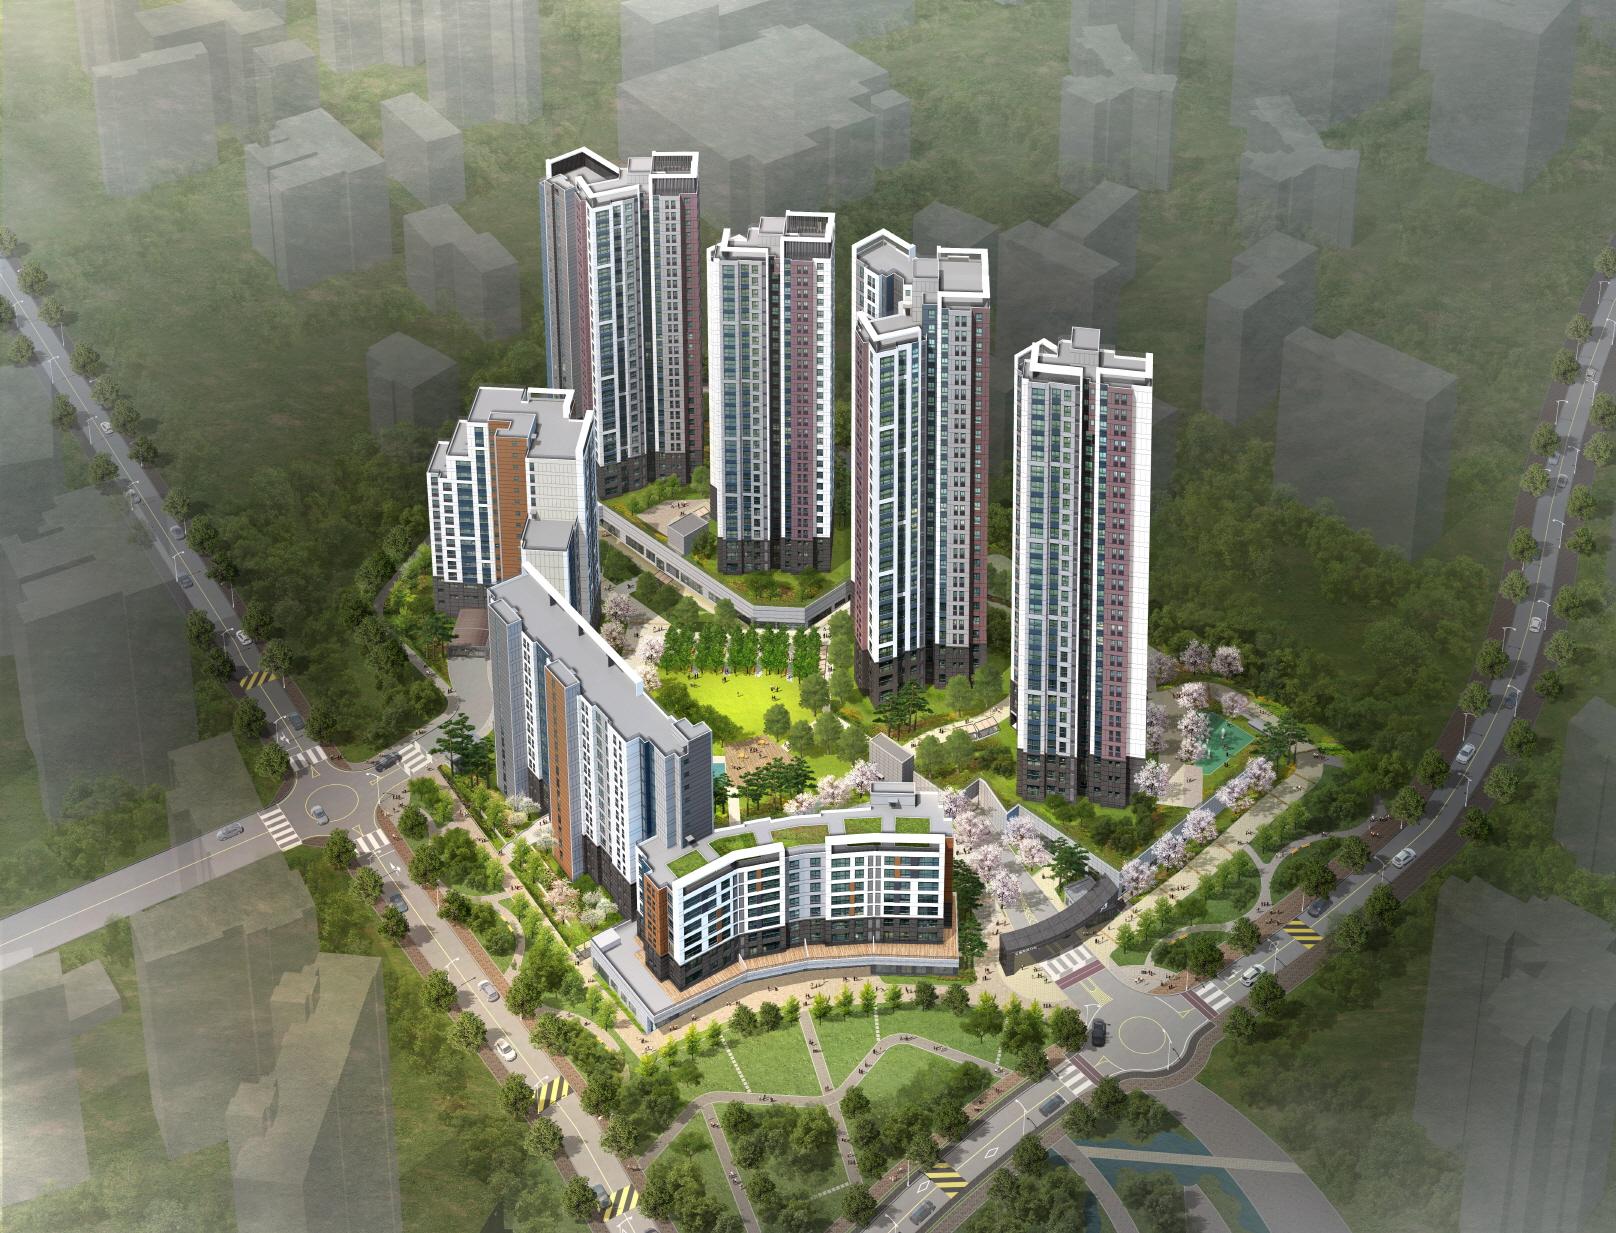 GS건설, 신길파크자이 8일 견본주택 오픈